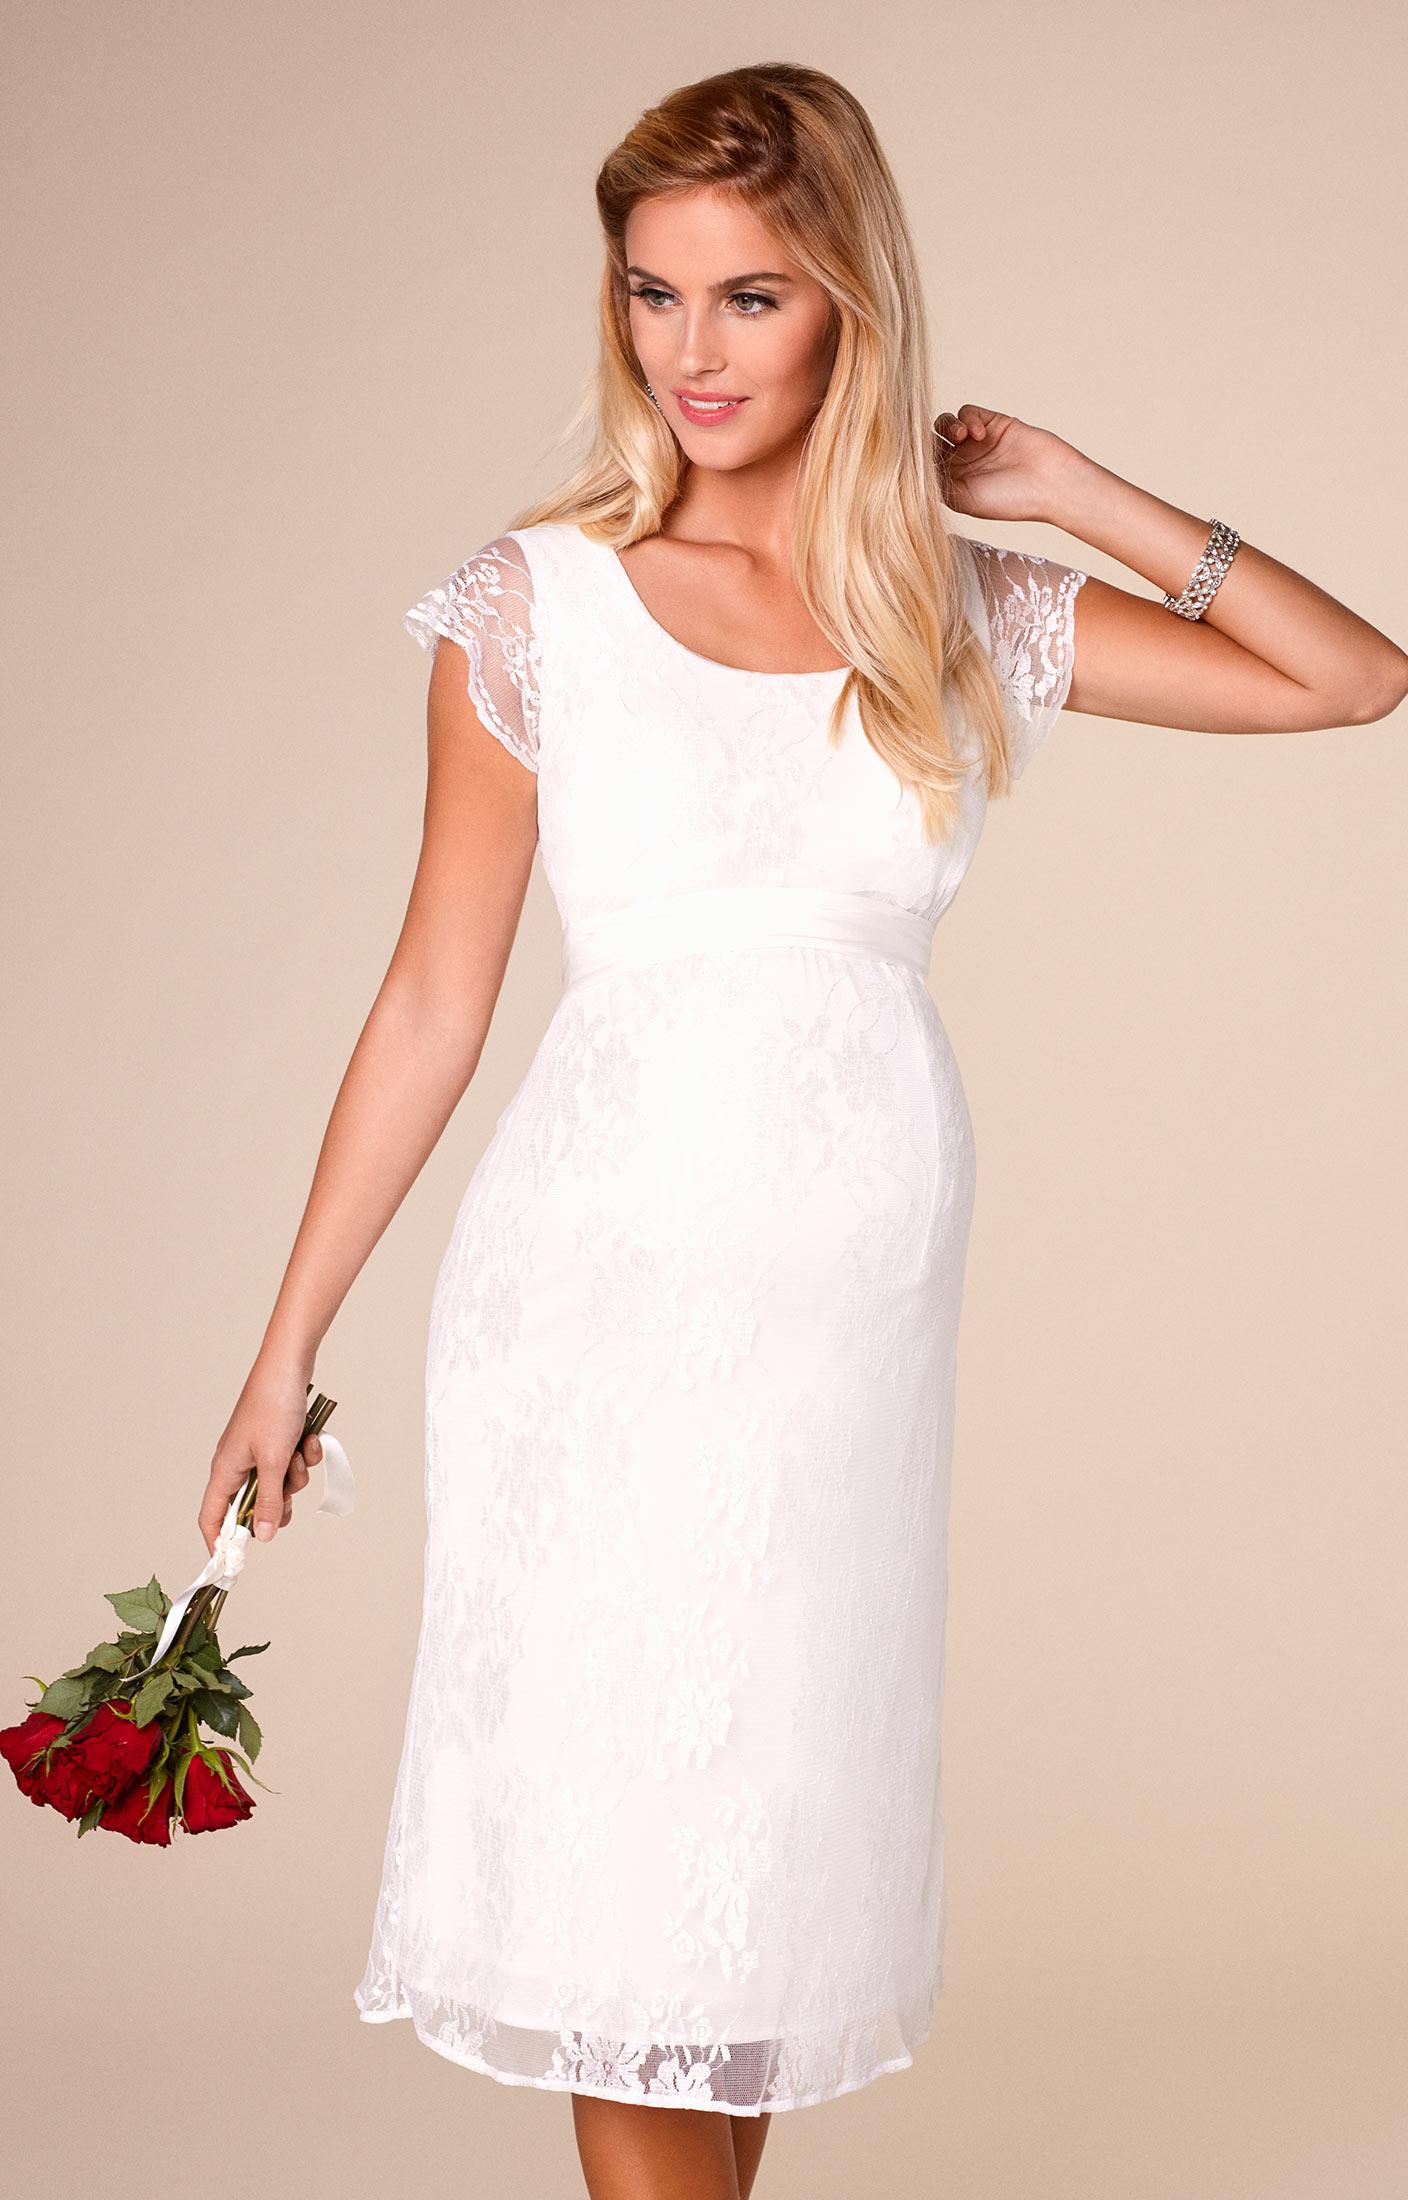 April Wedding Nursing Lace Dress Ivory by Tiffany Rose ccf56dfda